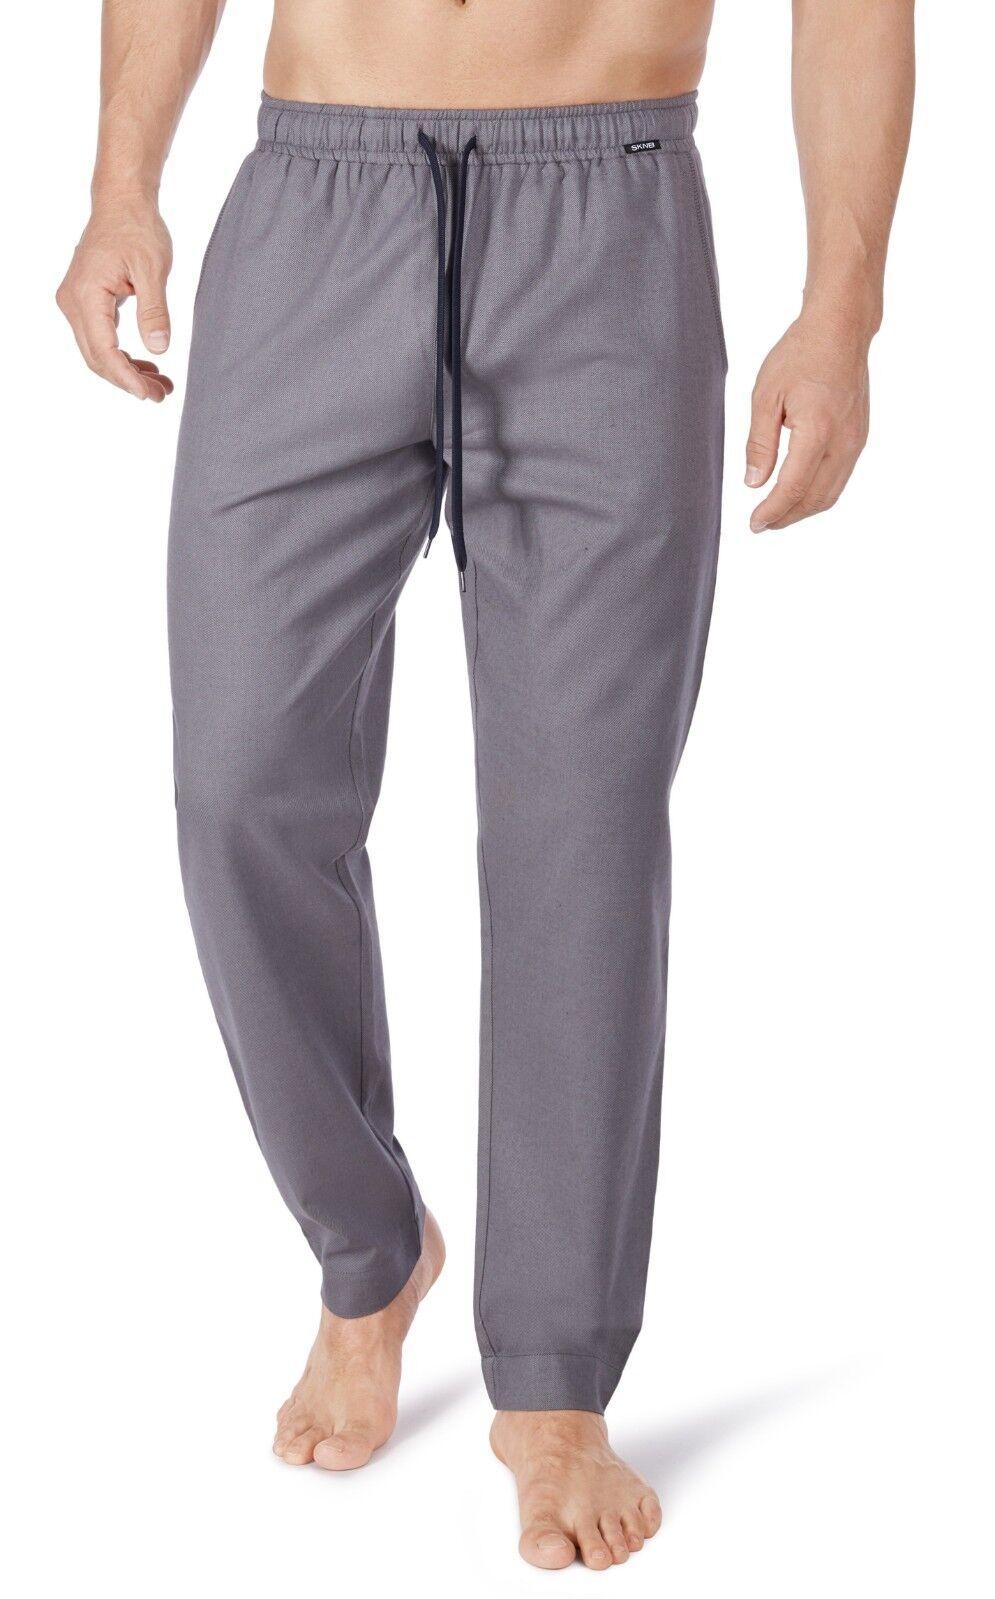 Skiny Herren Loungewear Collection Hose Freizeithose 86717 1687